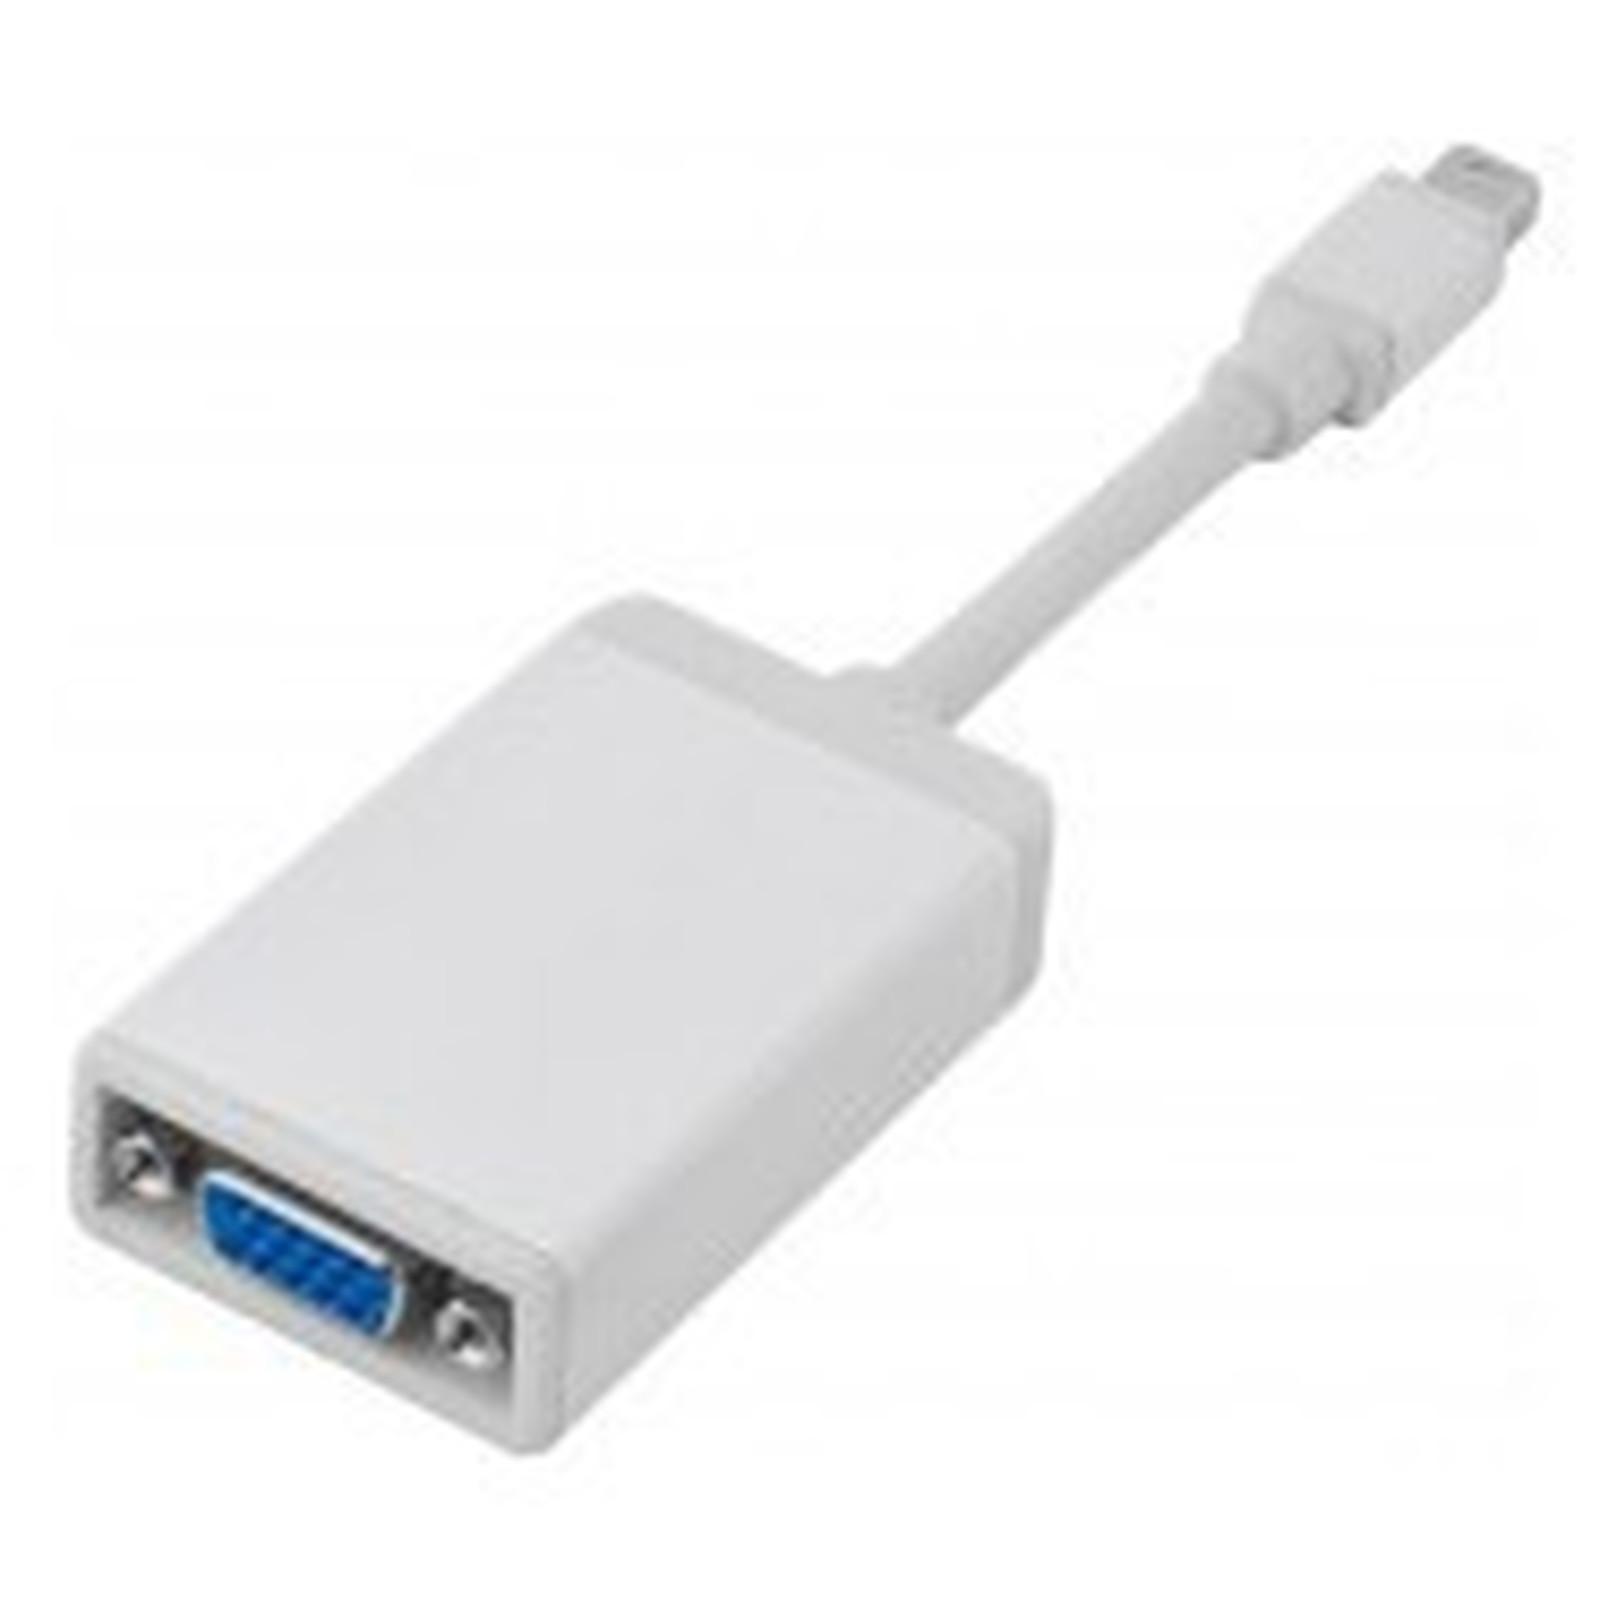 Adaptateur actif Mini DisplayPort mâle / VGA femelle (compatible Full HD)